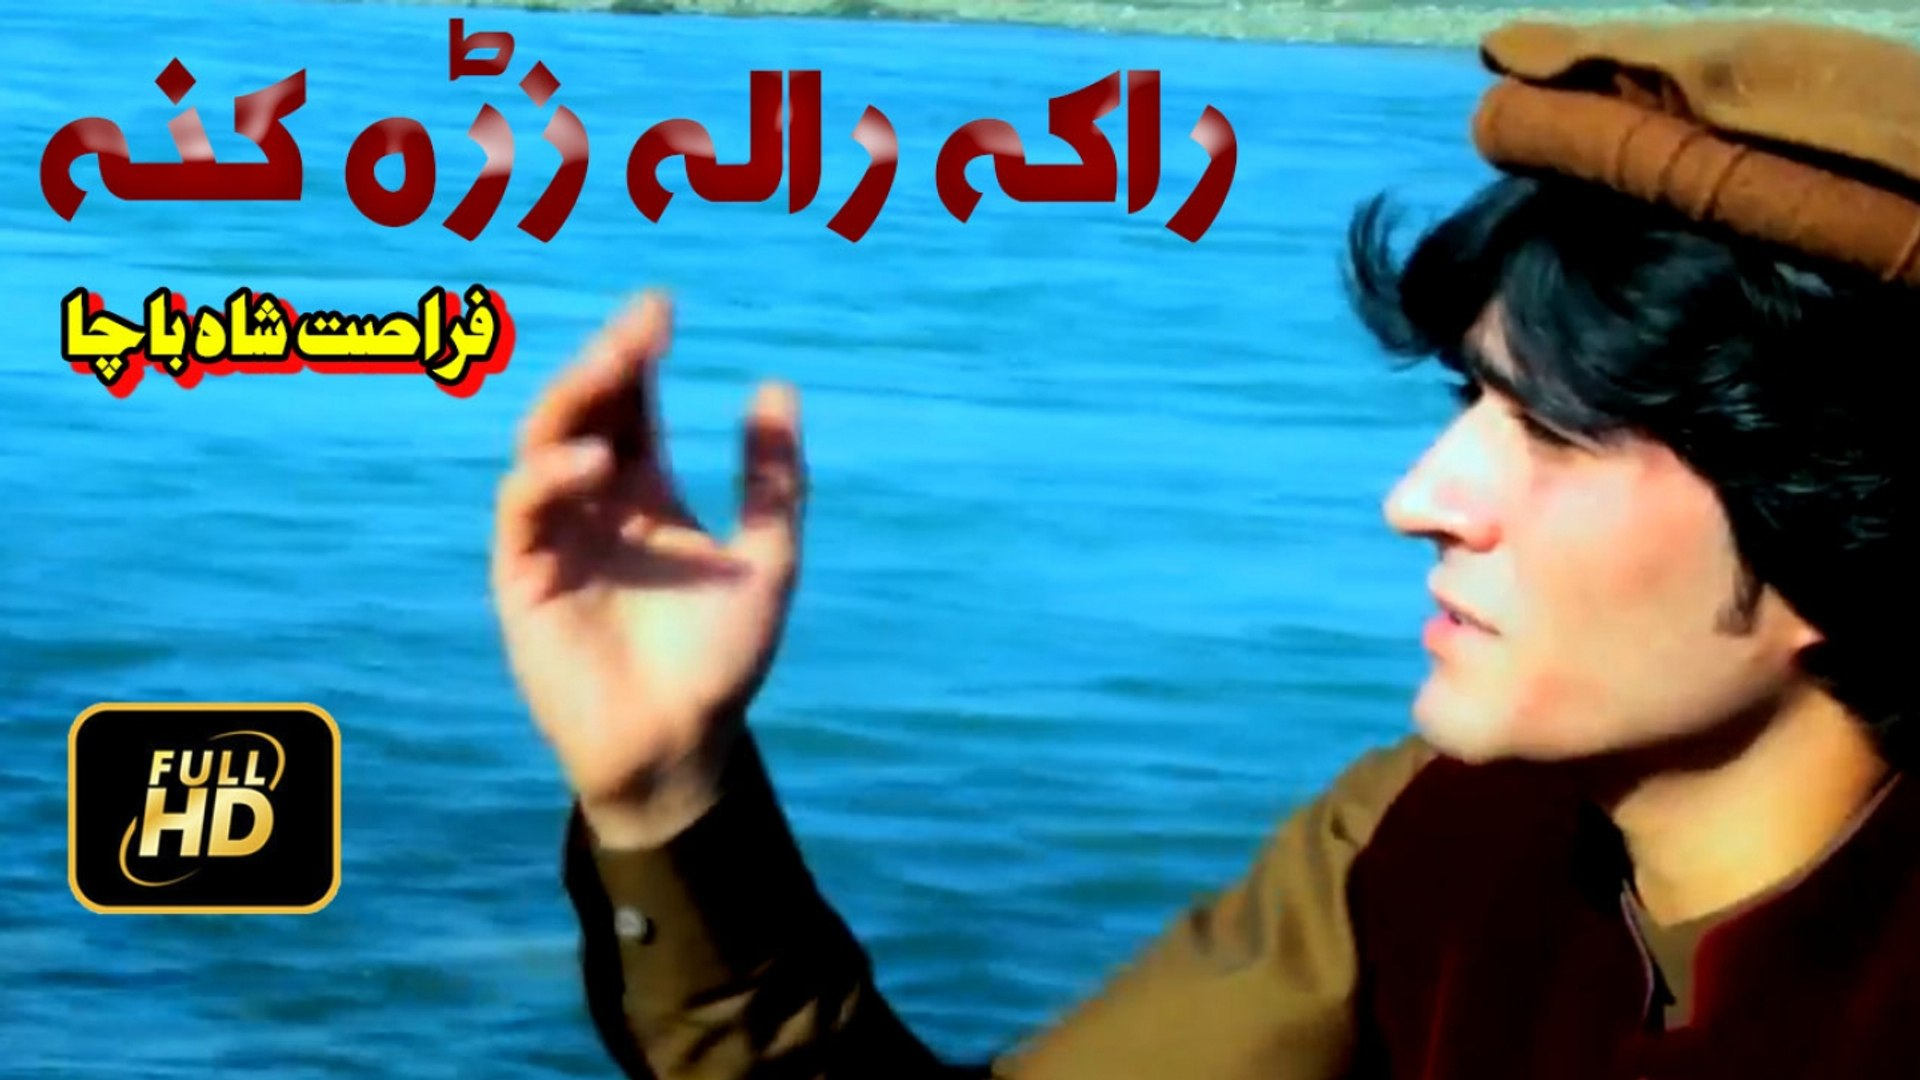 Farasat Shah Bacha New HD Song - Raka Rala Zre Kana